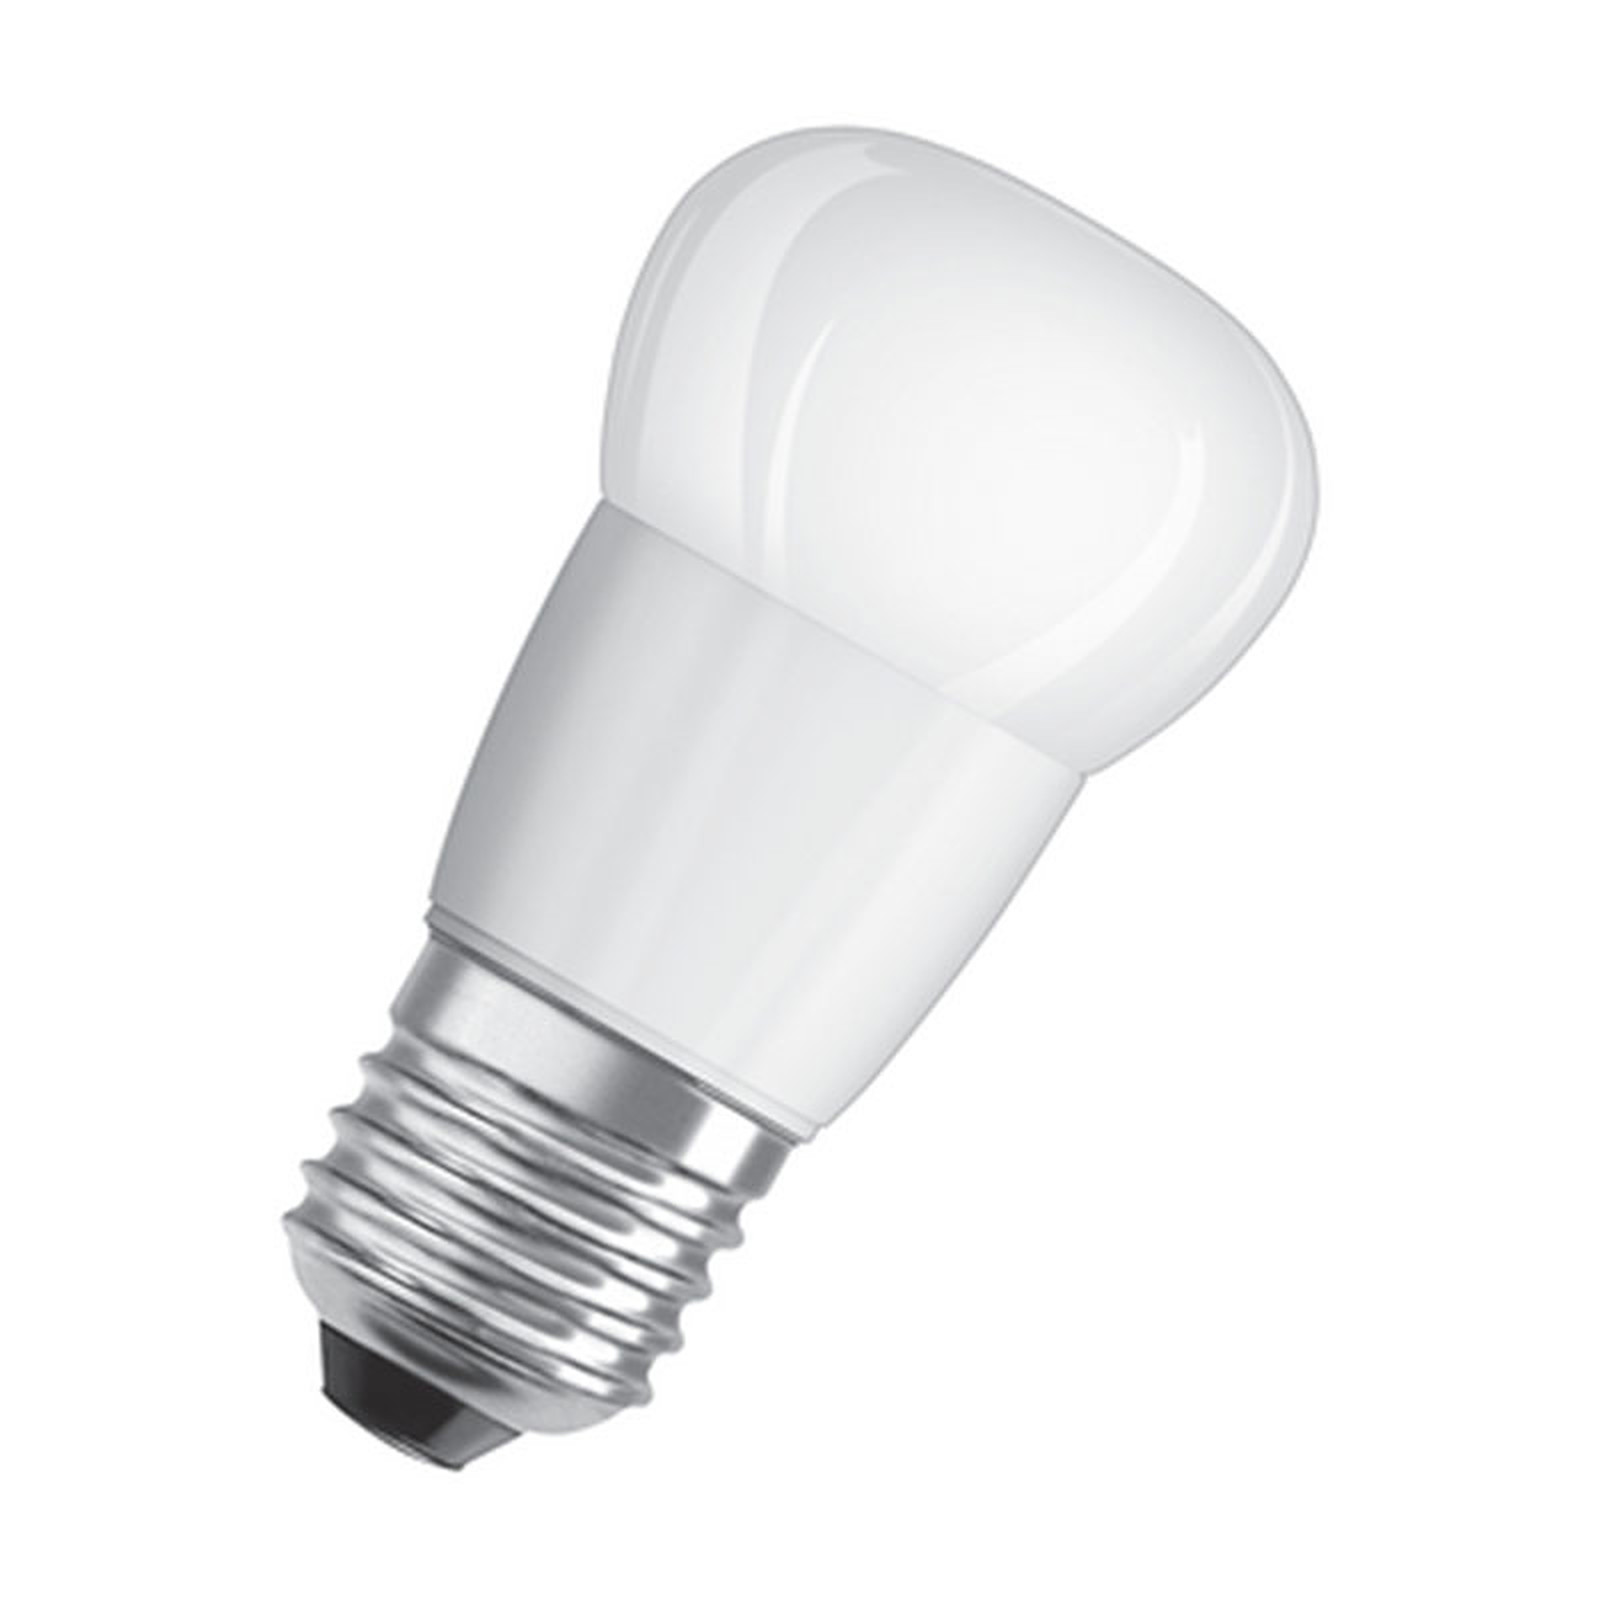 Osram Ampoule Led Retrofit Standard E27 4w 40w A: OSRAM Ampoule LED Star Sphérique E27 5.7W (40W) A